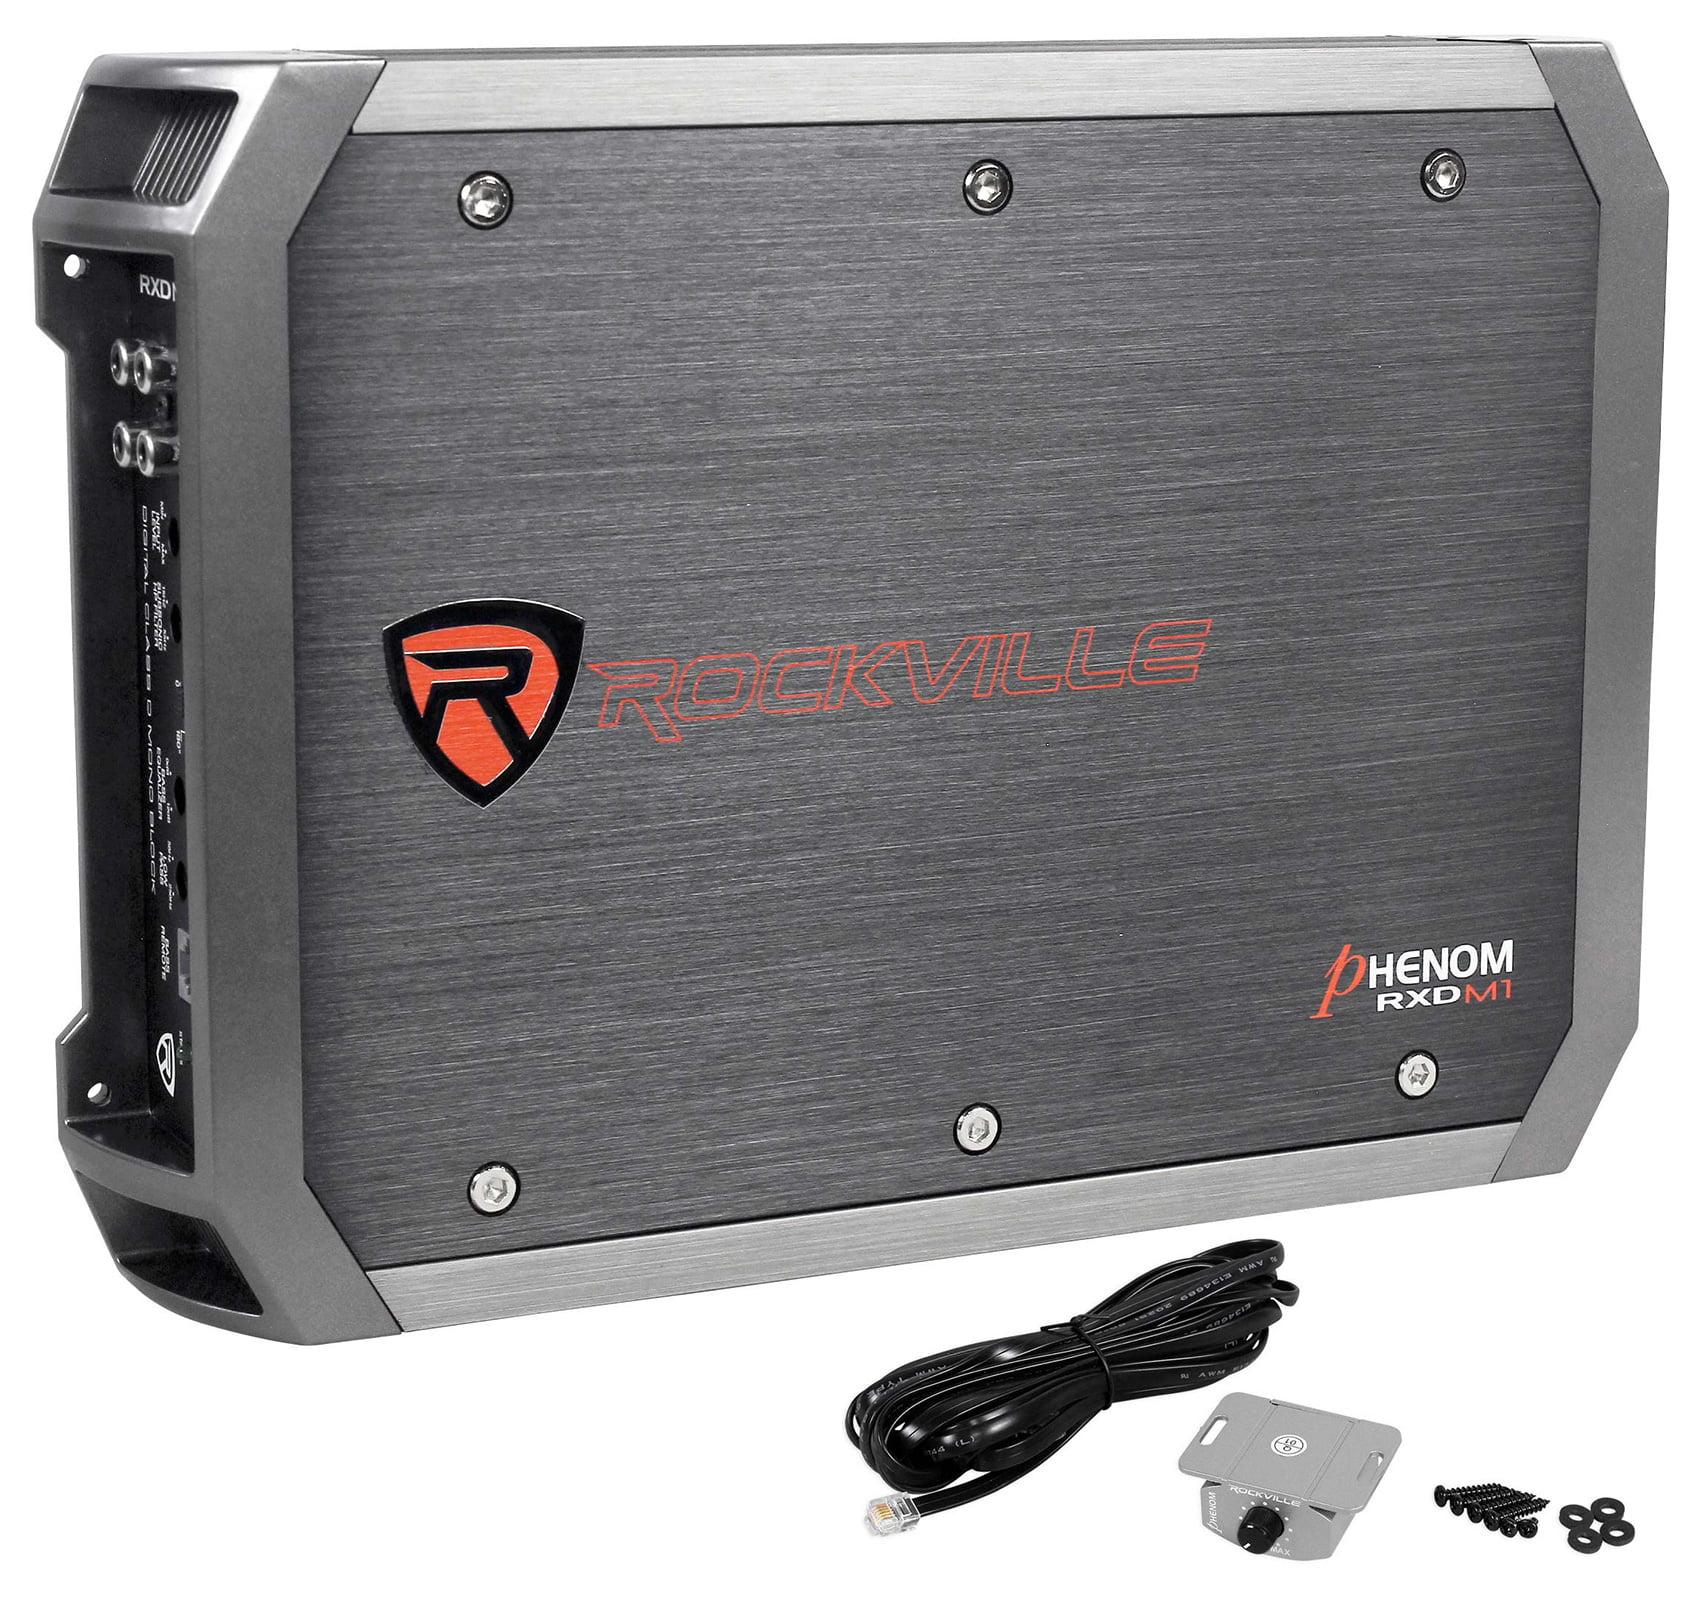 "Rockville 1000w Mono Amplifier Amp For (2) Kicker COMPR8 CWR8-4 8"" Subwoofers"